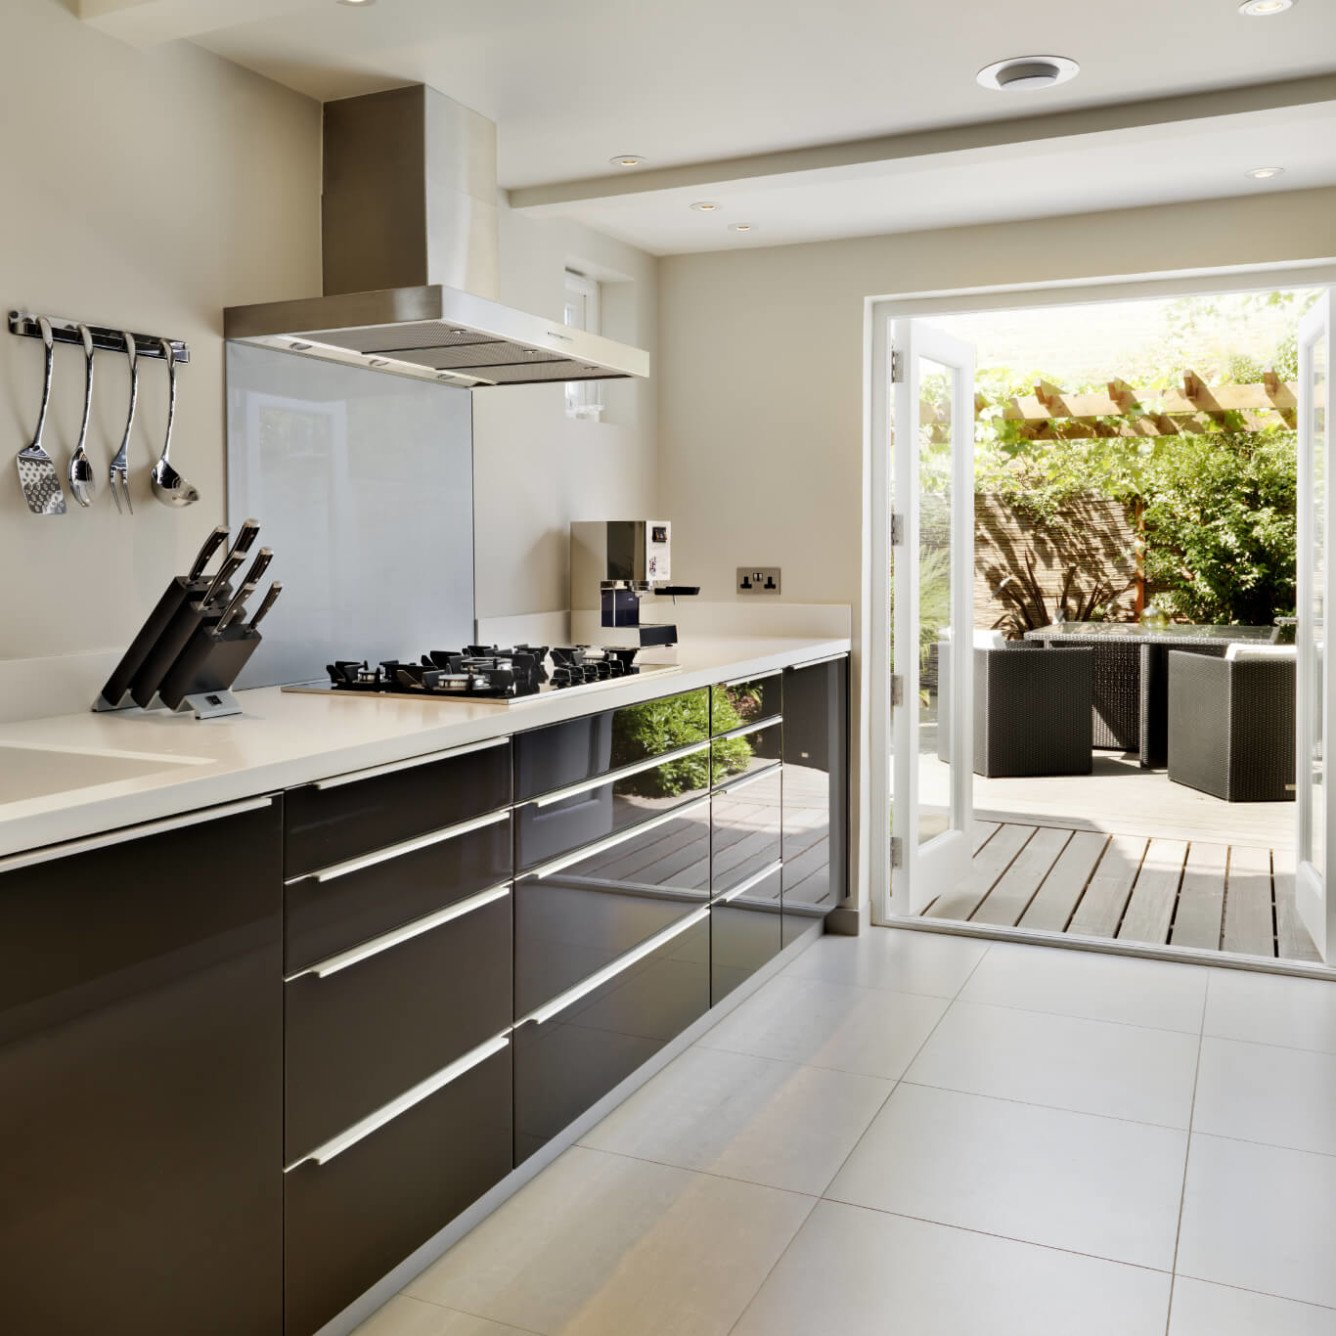 House in Fulham - Bespoke gloss dark brown kitchen and white corian worktop